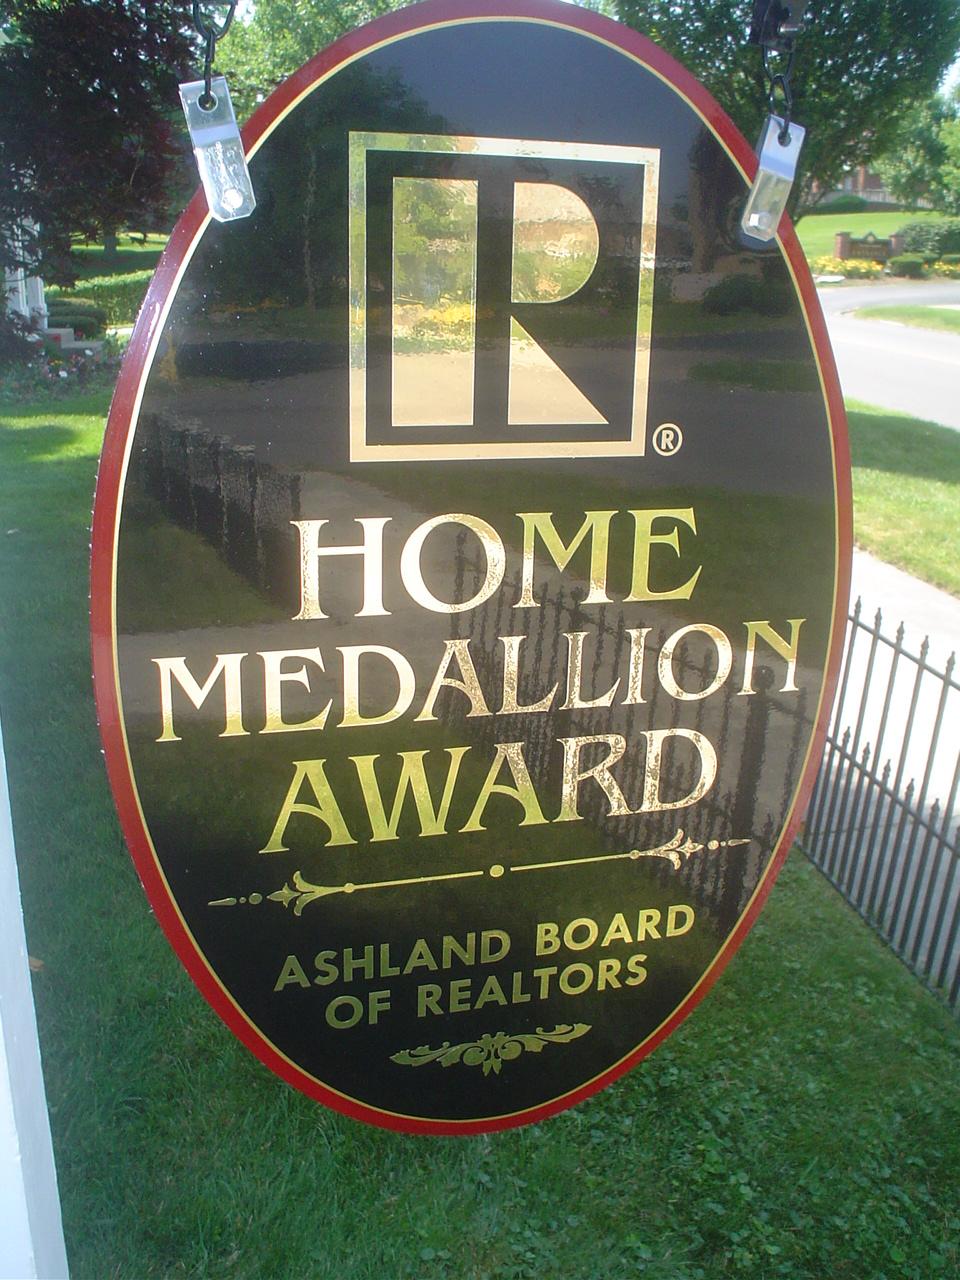 home medallion sign